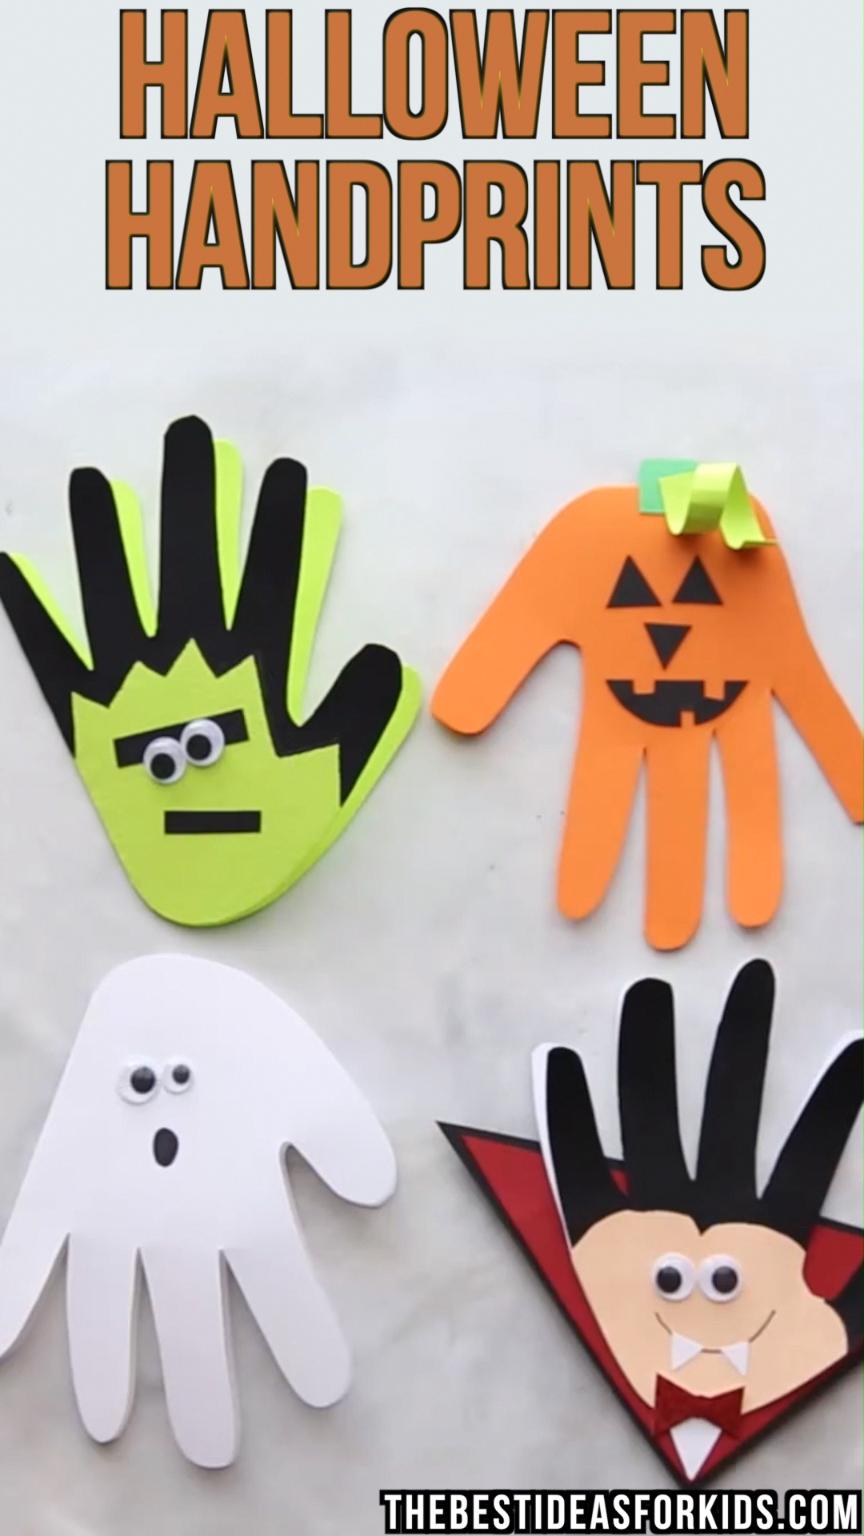 Halloween Pumpkin Face Trick Treat Kids Halloween Pumpkin Face Trick Or Treat Ha Halloween Crafts For Kids Winter Crafts For Kids Halloween Crafts For Toddlers